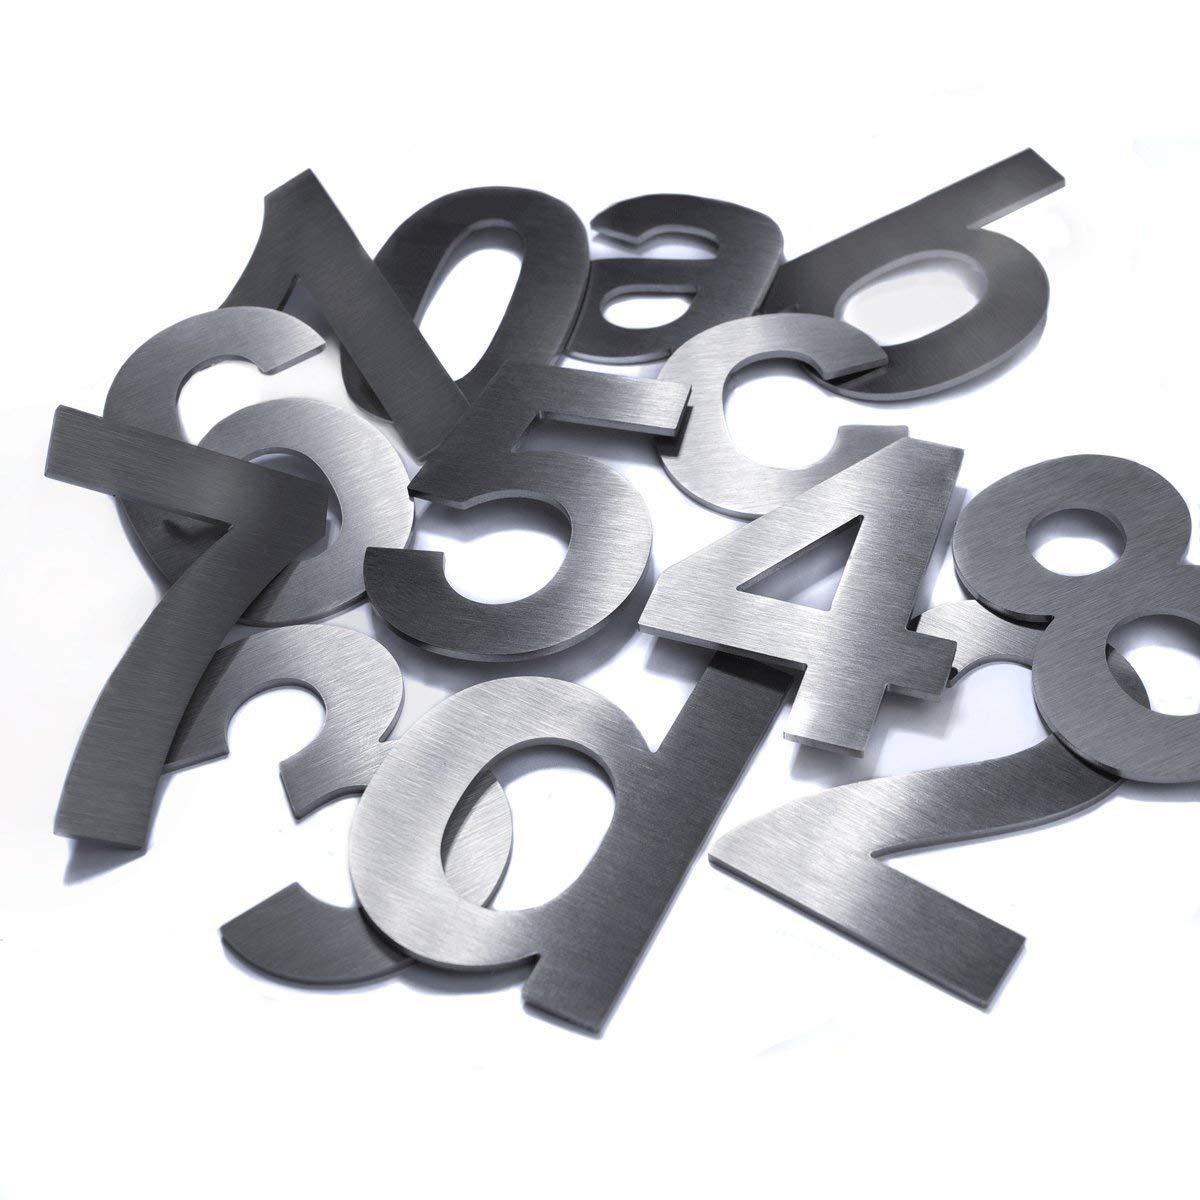 200mm 2mm 0 Materialst/ärke Hochwertige Edelstahl V2A HausnummerKlassisch grob geschliffen massiv /& rostfrei H/öhe